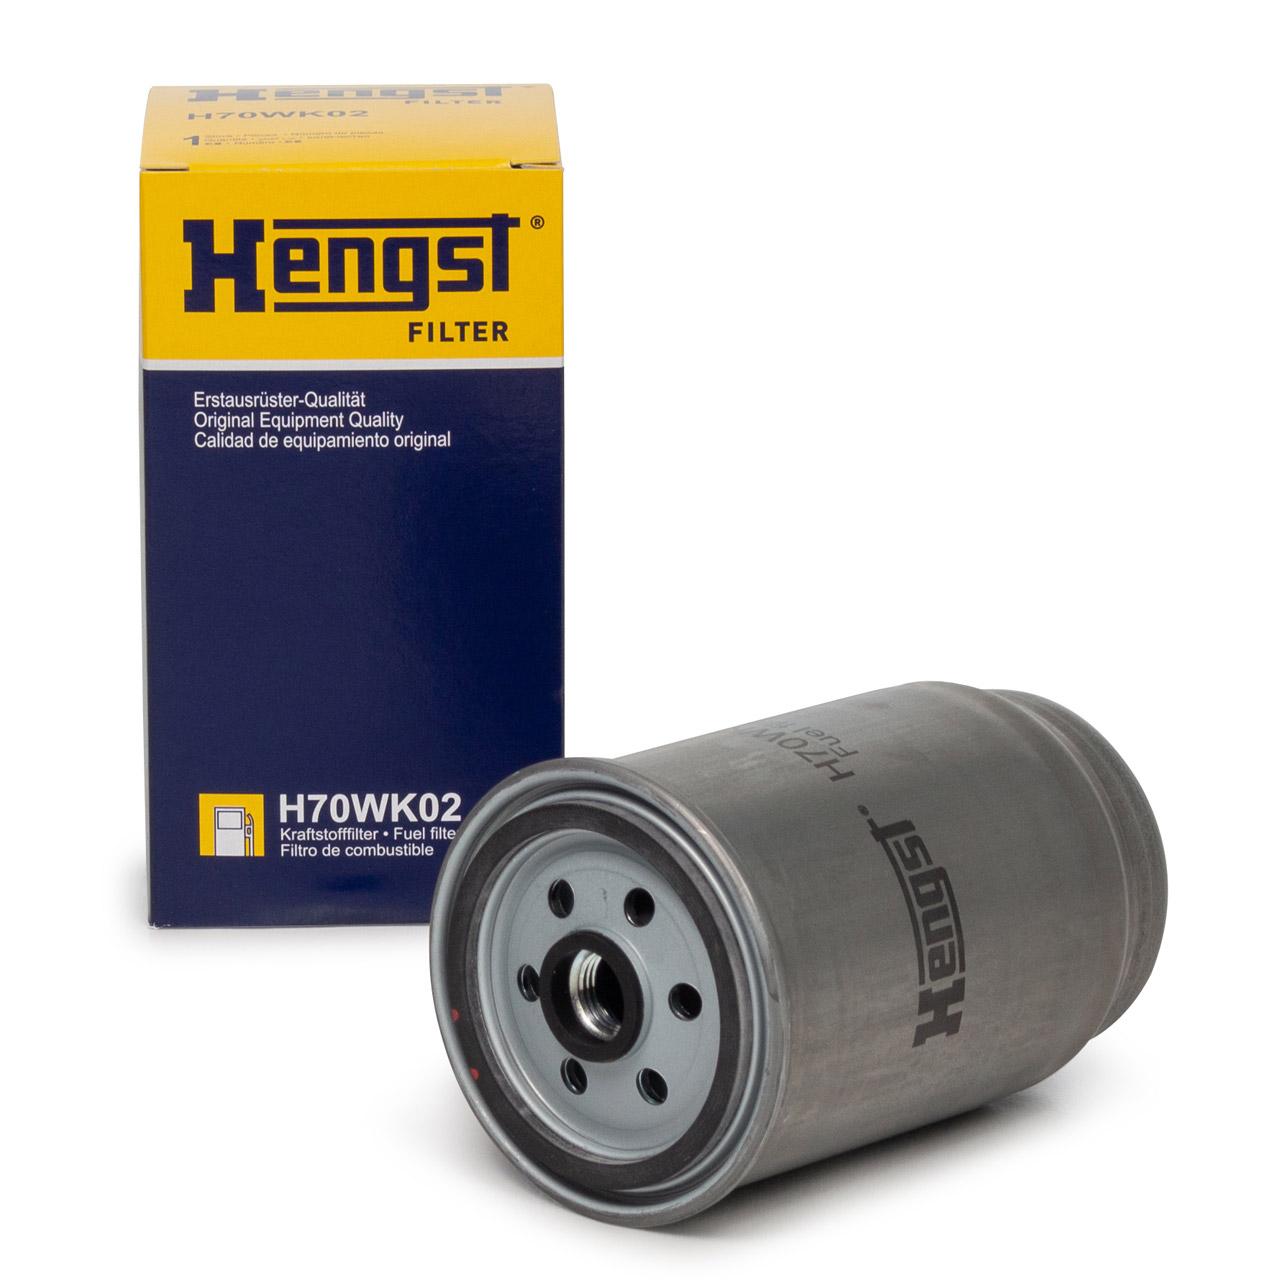 HENGST H70WK02 Kraftstofffilter Dieselfilter AUDI FIAT FORD OPEL SEAT VOLVO VW